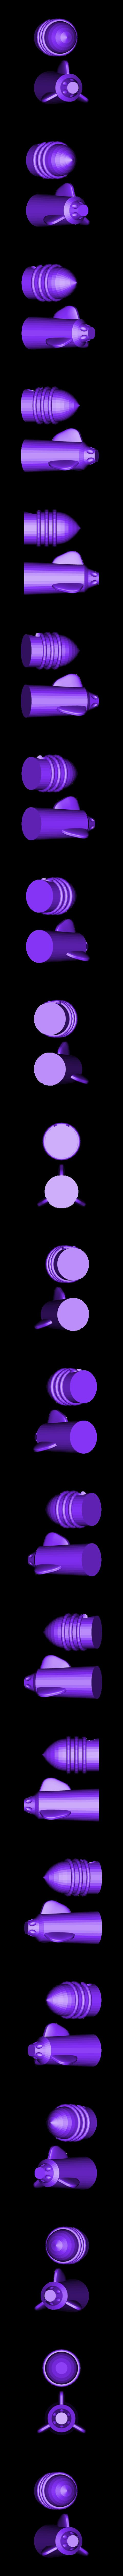 MusicalOrreryRocket.stl Download free STL file Musical Orrery • 3D printable template, Zippityboomba